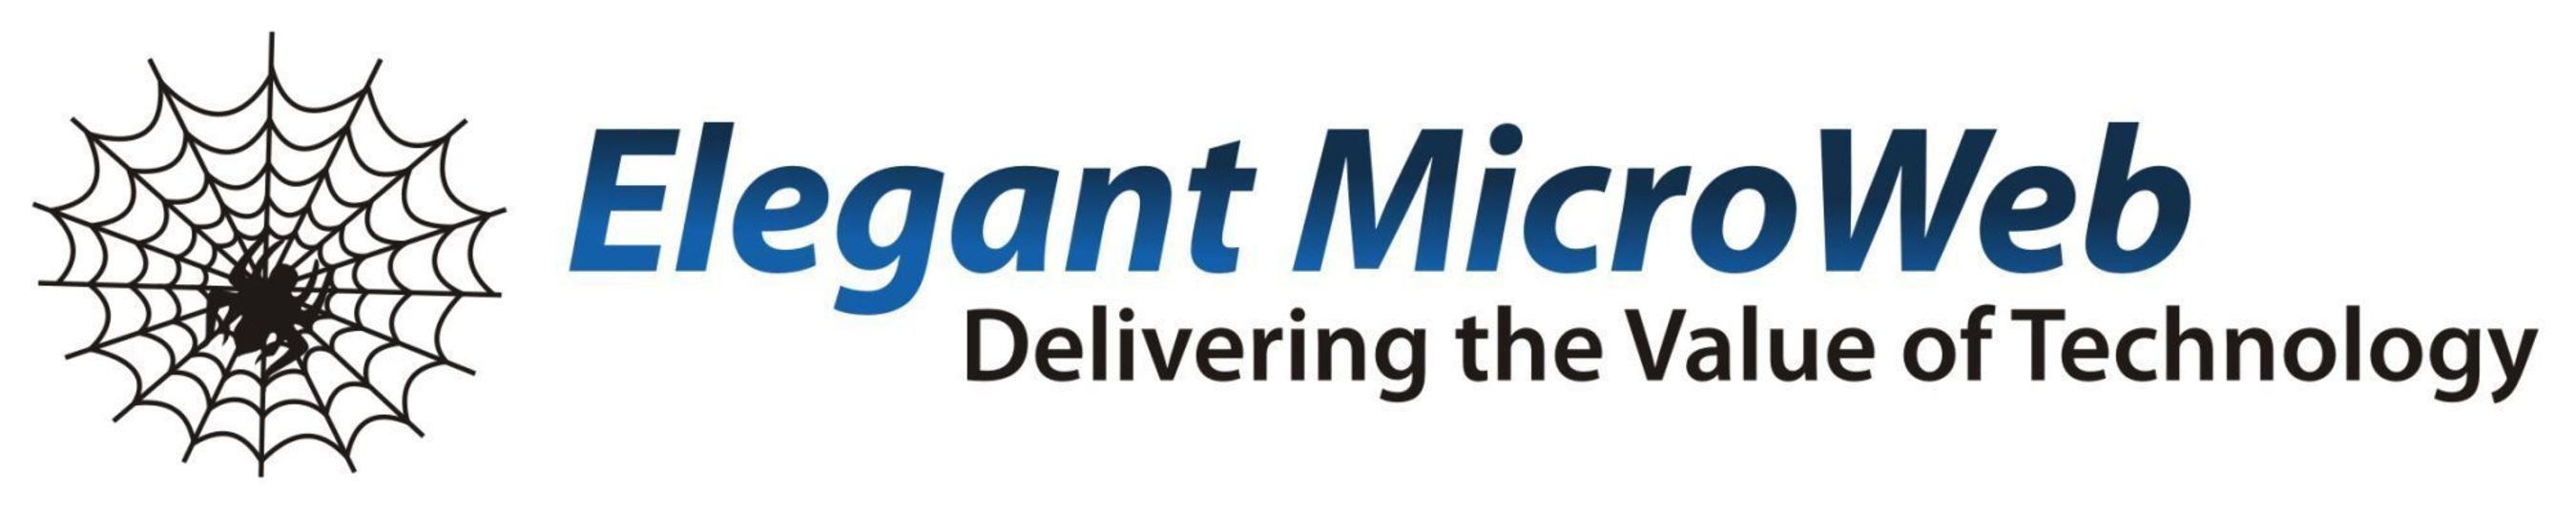 Elegant MicroWeb Logo (PRNewsFoto/Elegant MicroWeb)